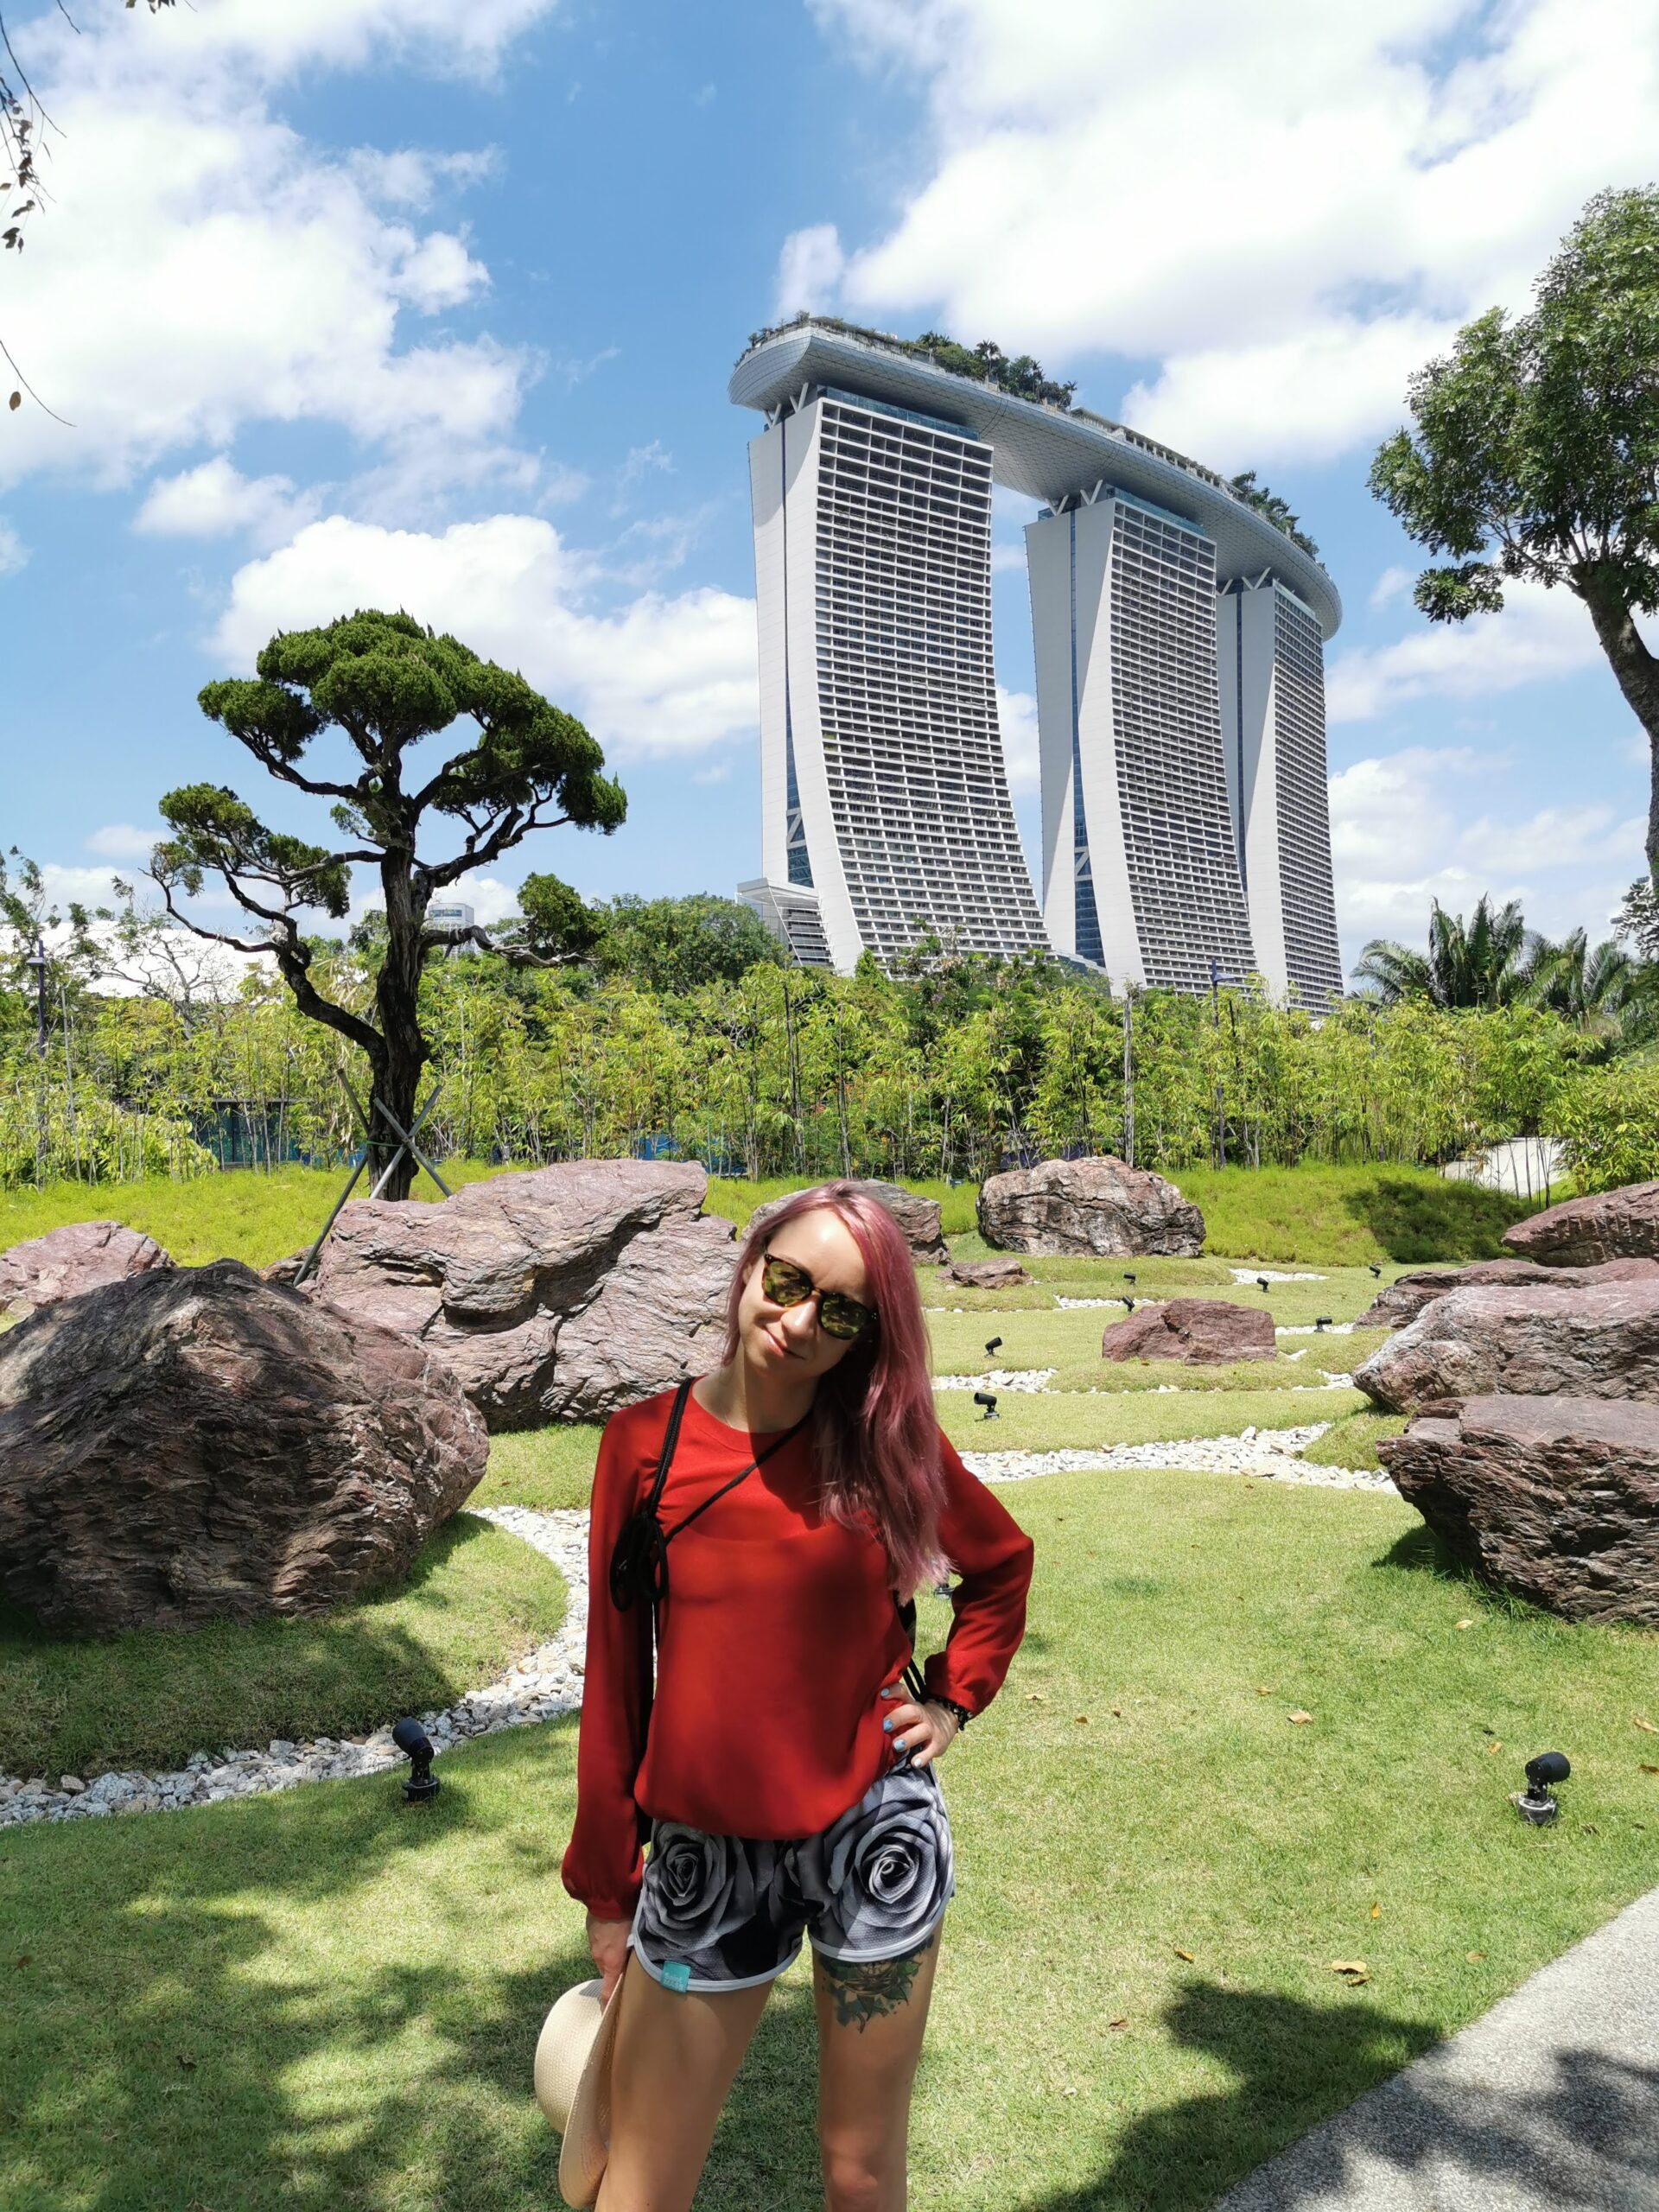 Singapur za darmo atrakcje